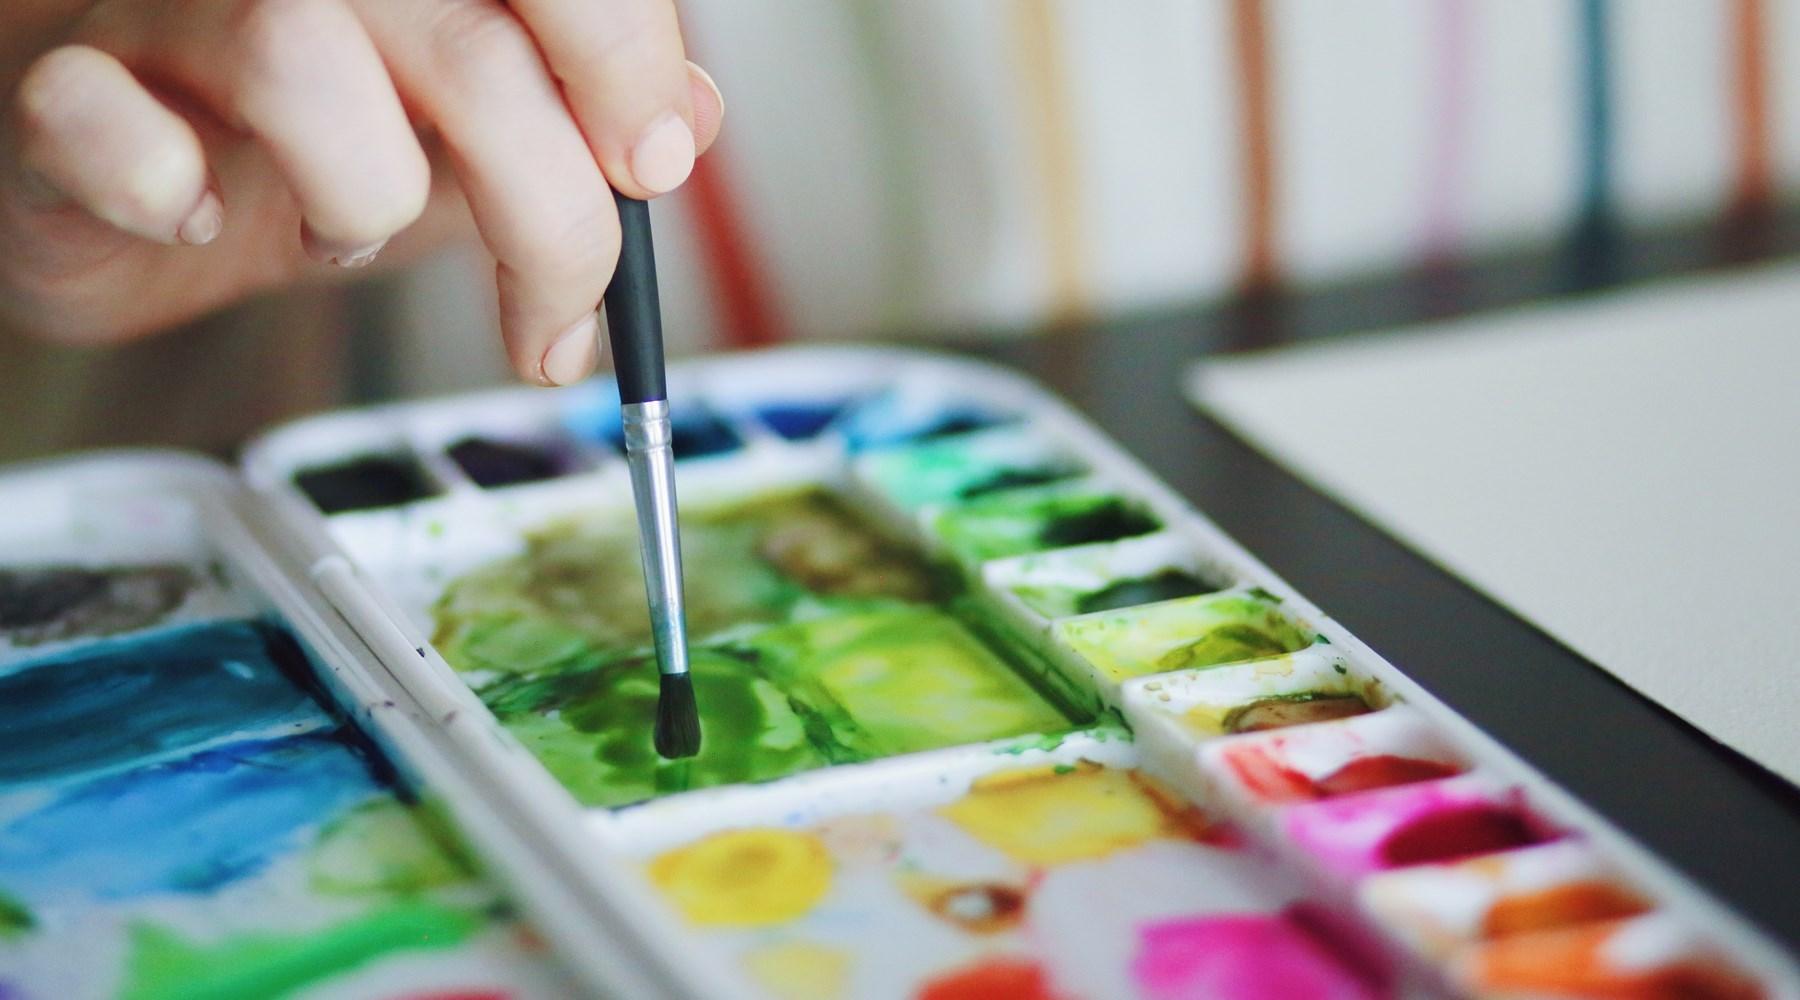 person mixing watercolour paint on a paint palette